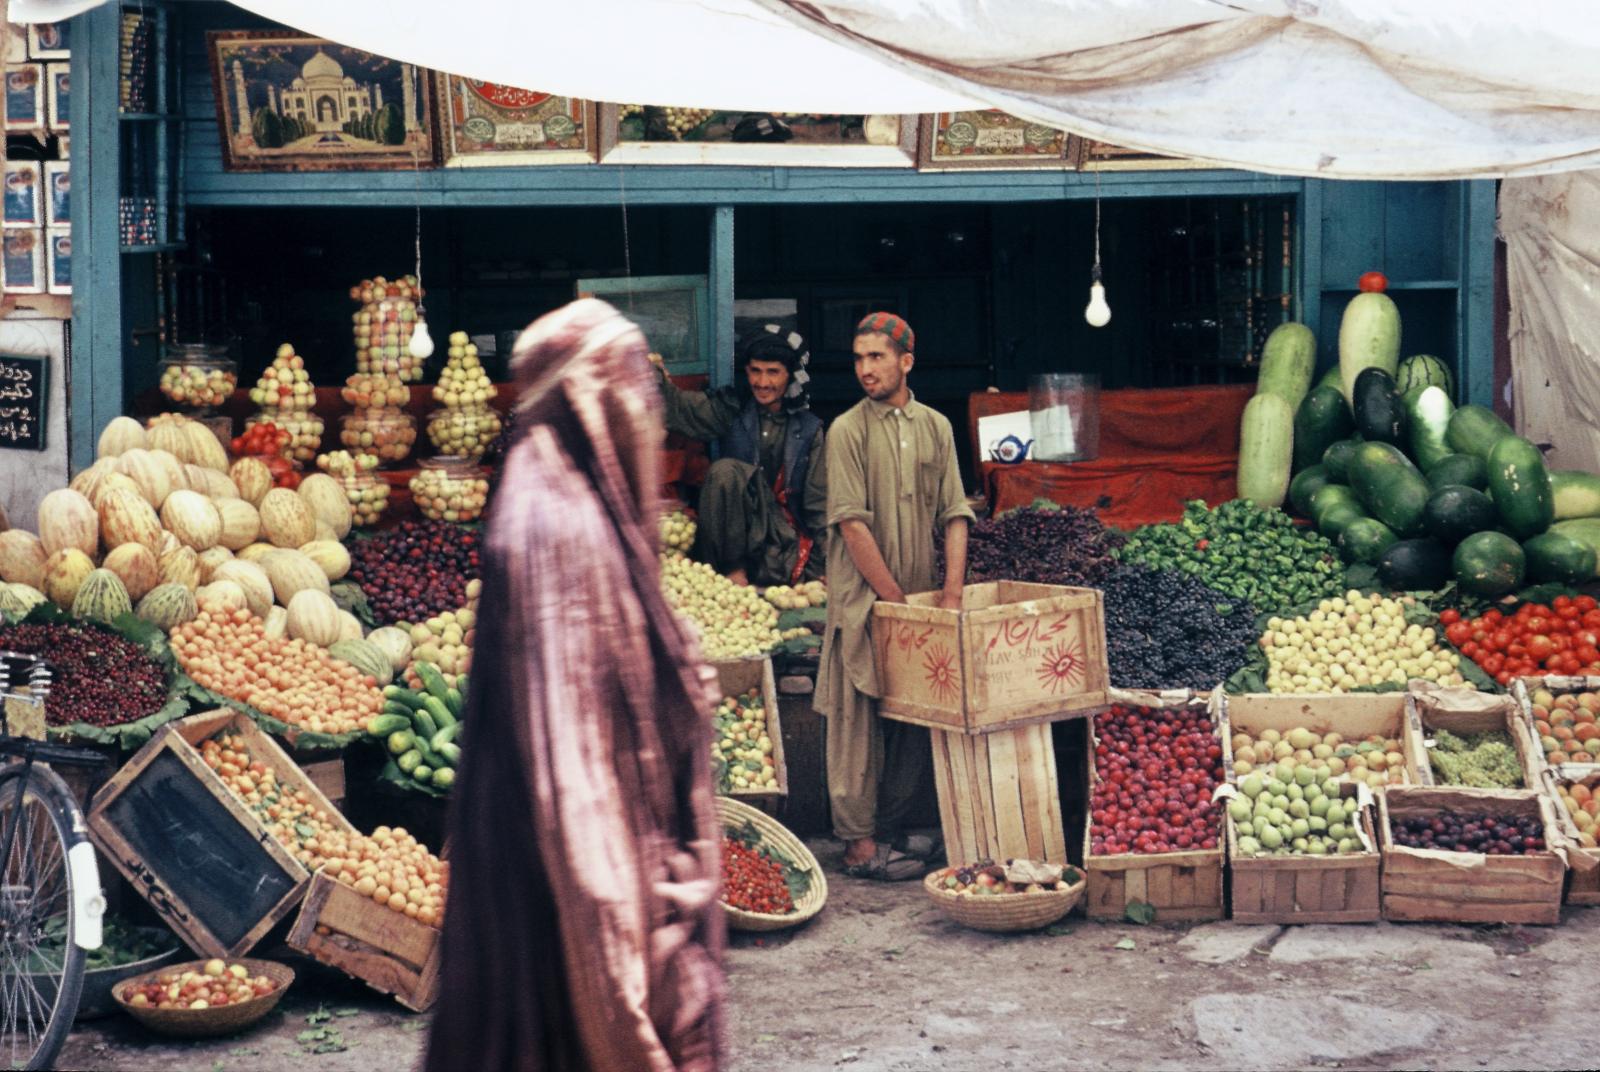 A032351-R1-04-5_Bazar Gemüse-21.jpg